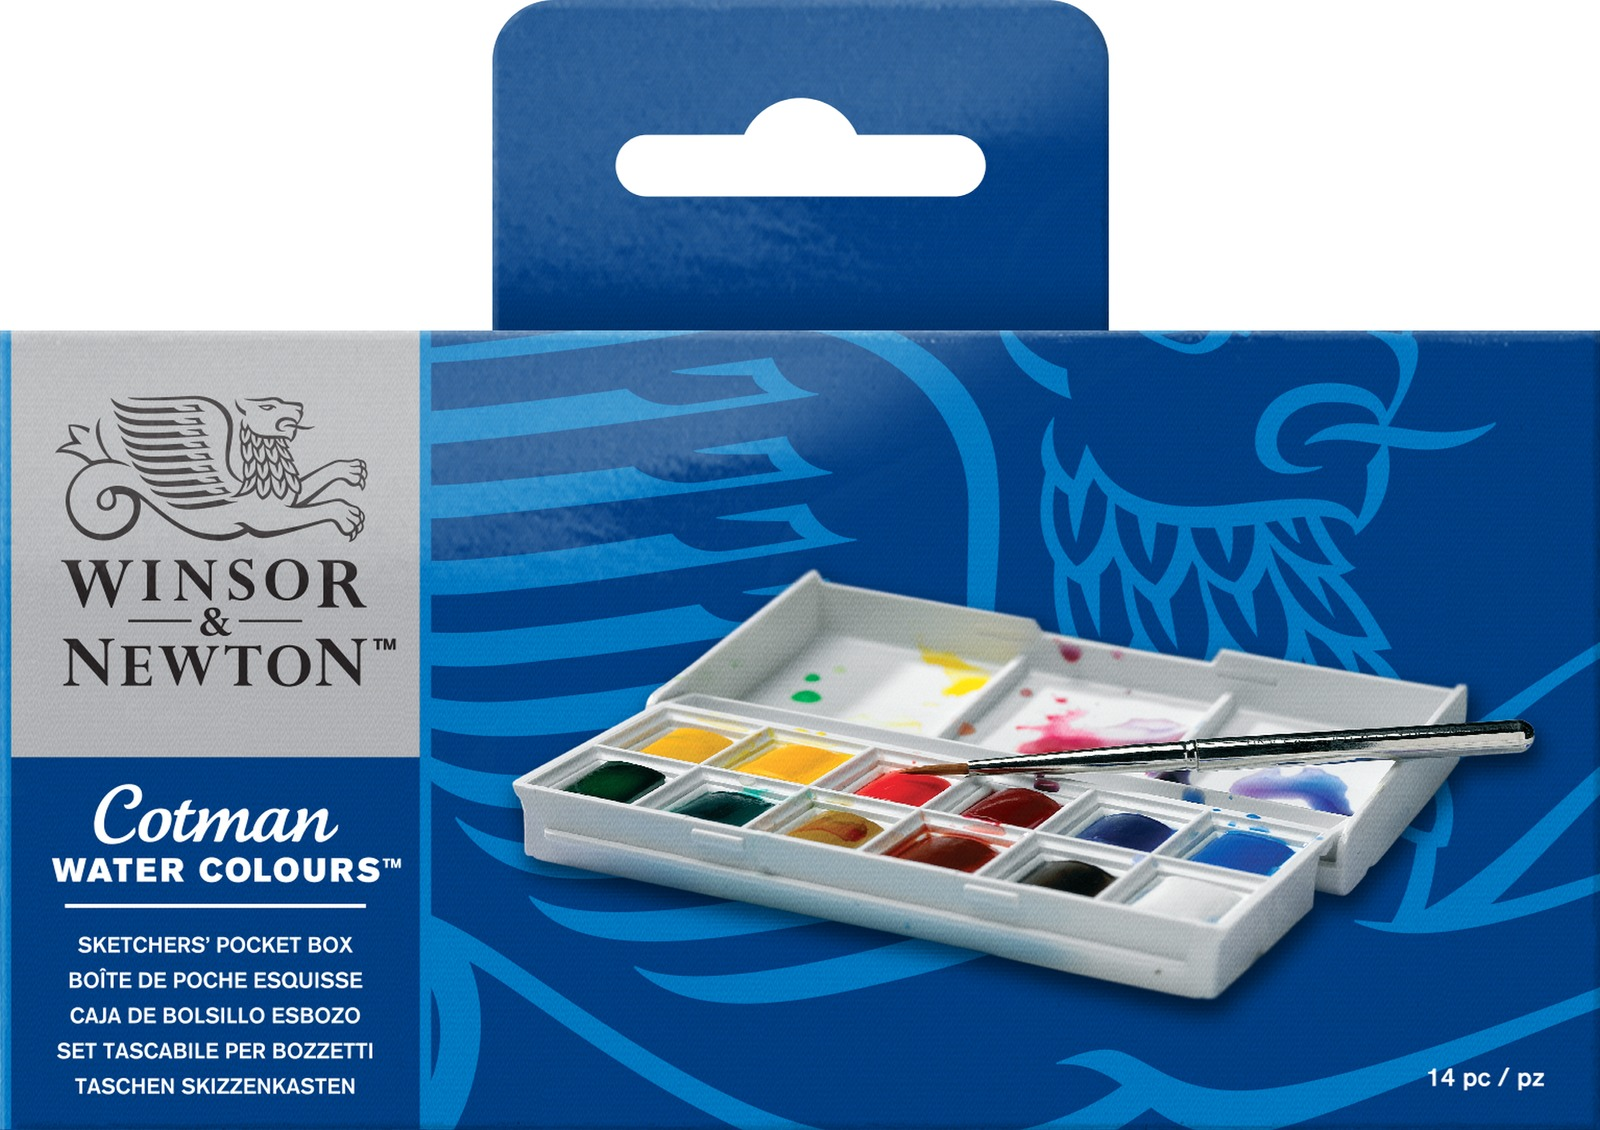 Winsor & Newton: Cotman Watercolour Sketchers' Pocket Box image